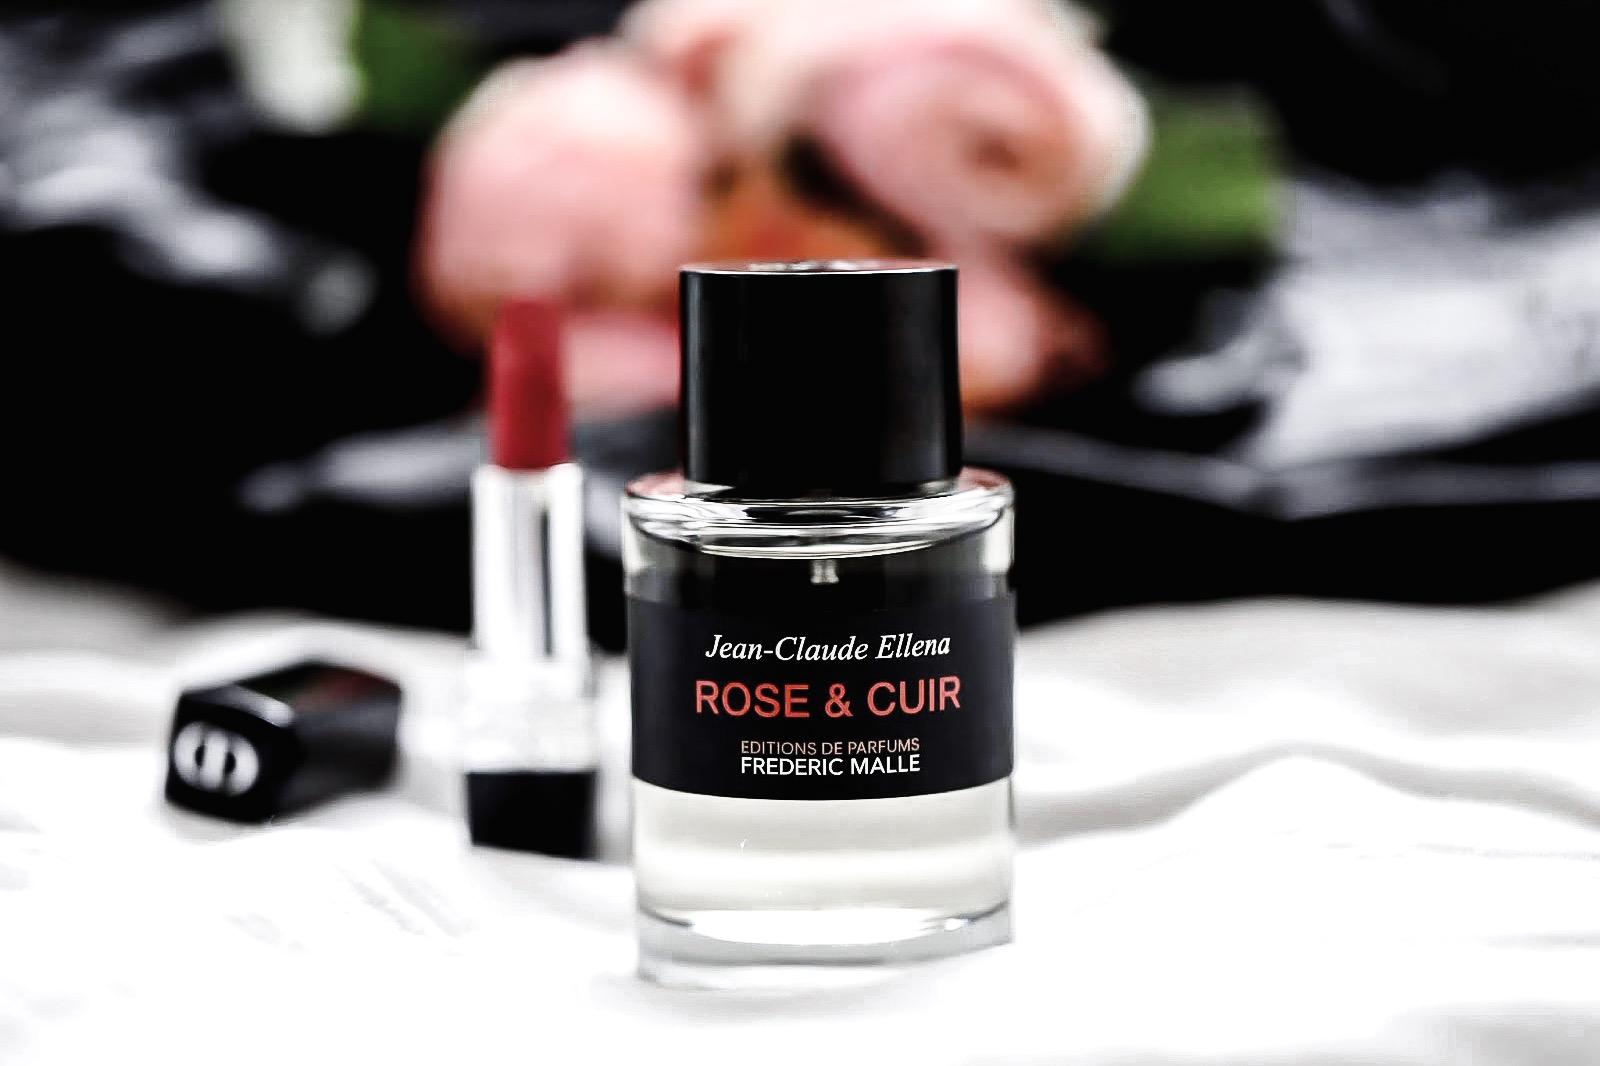 rose-cuir-frederic-malle-jean-claude-ellena-parfum-avis-test-critique